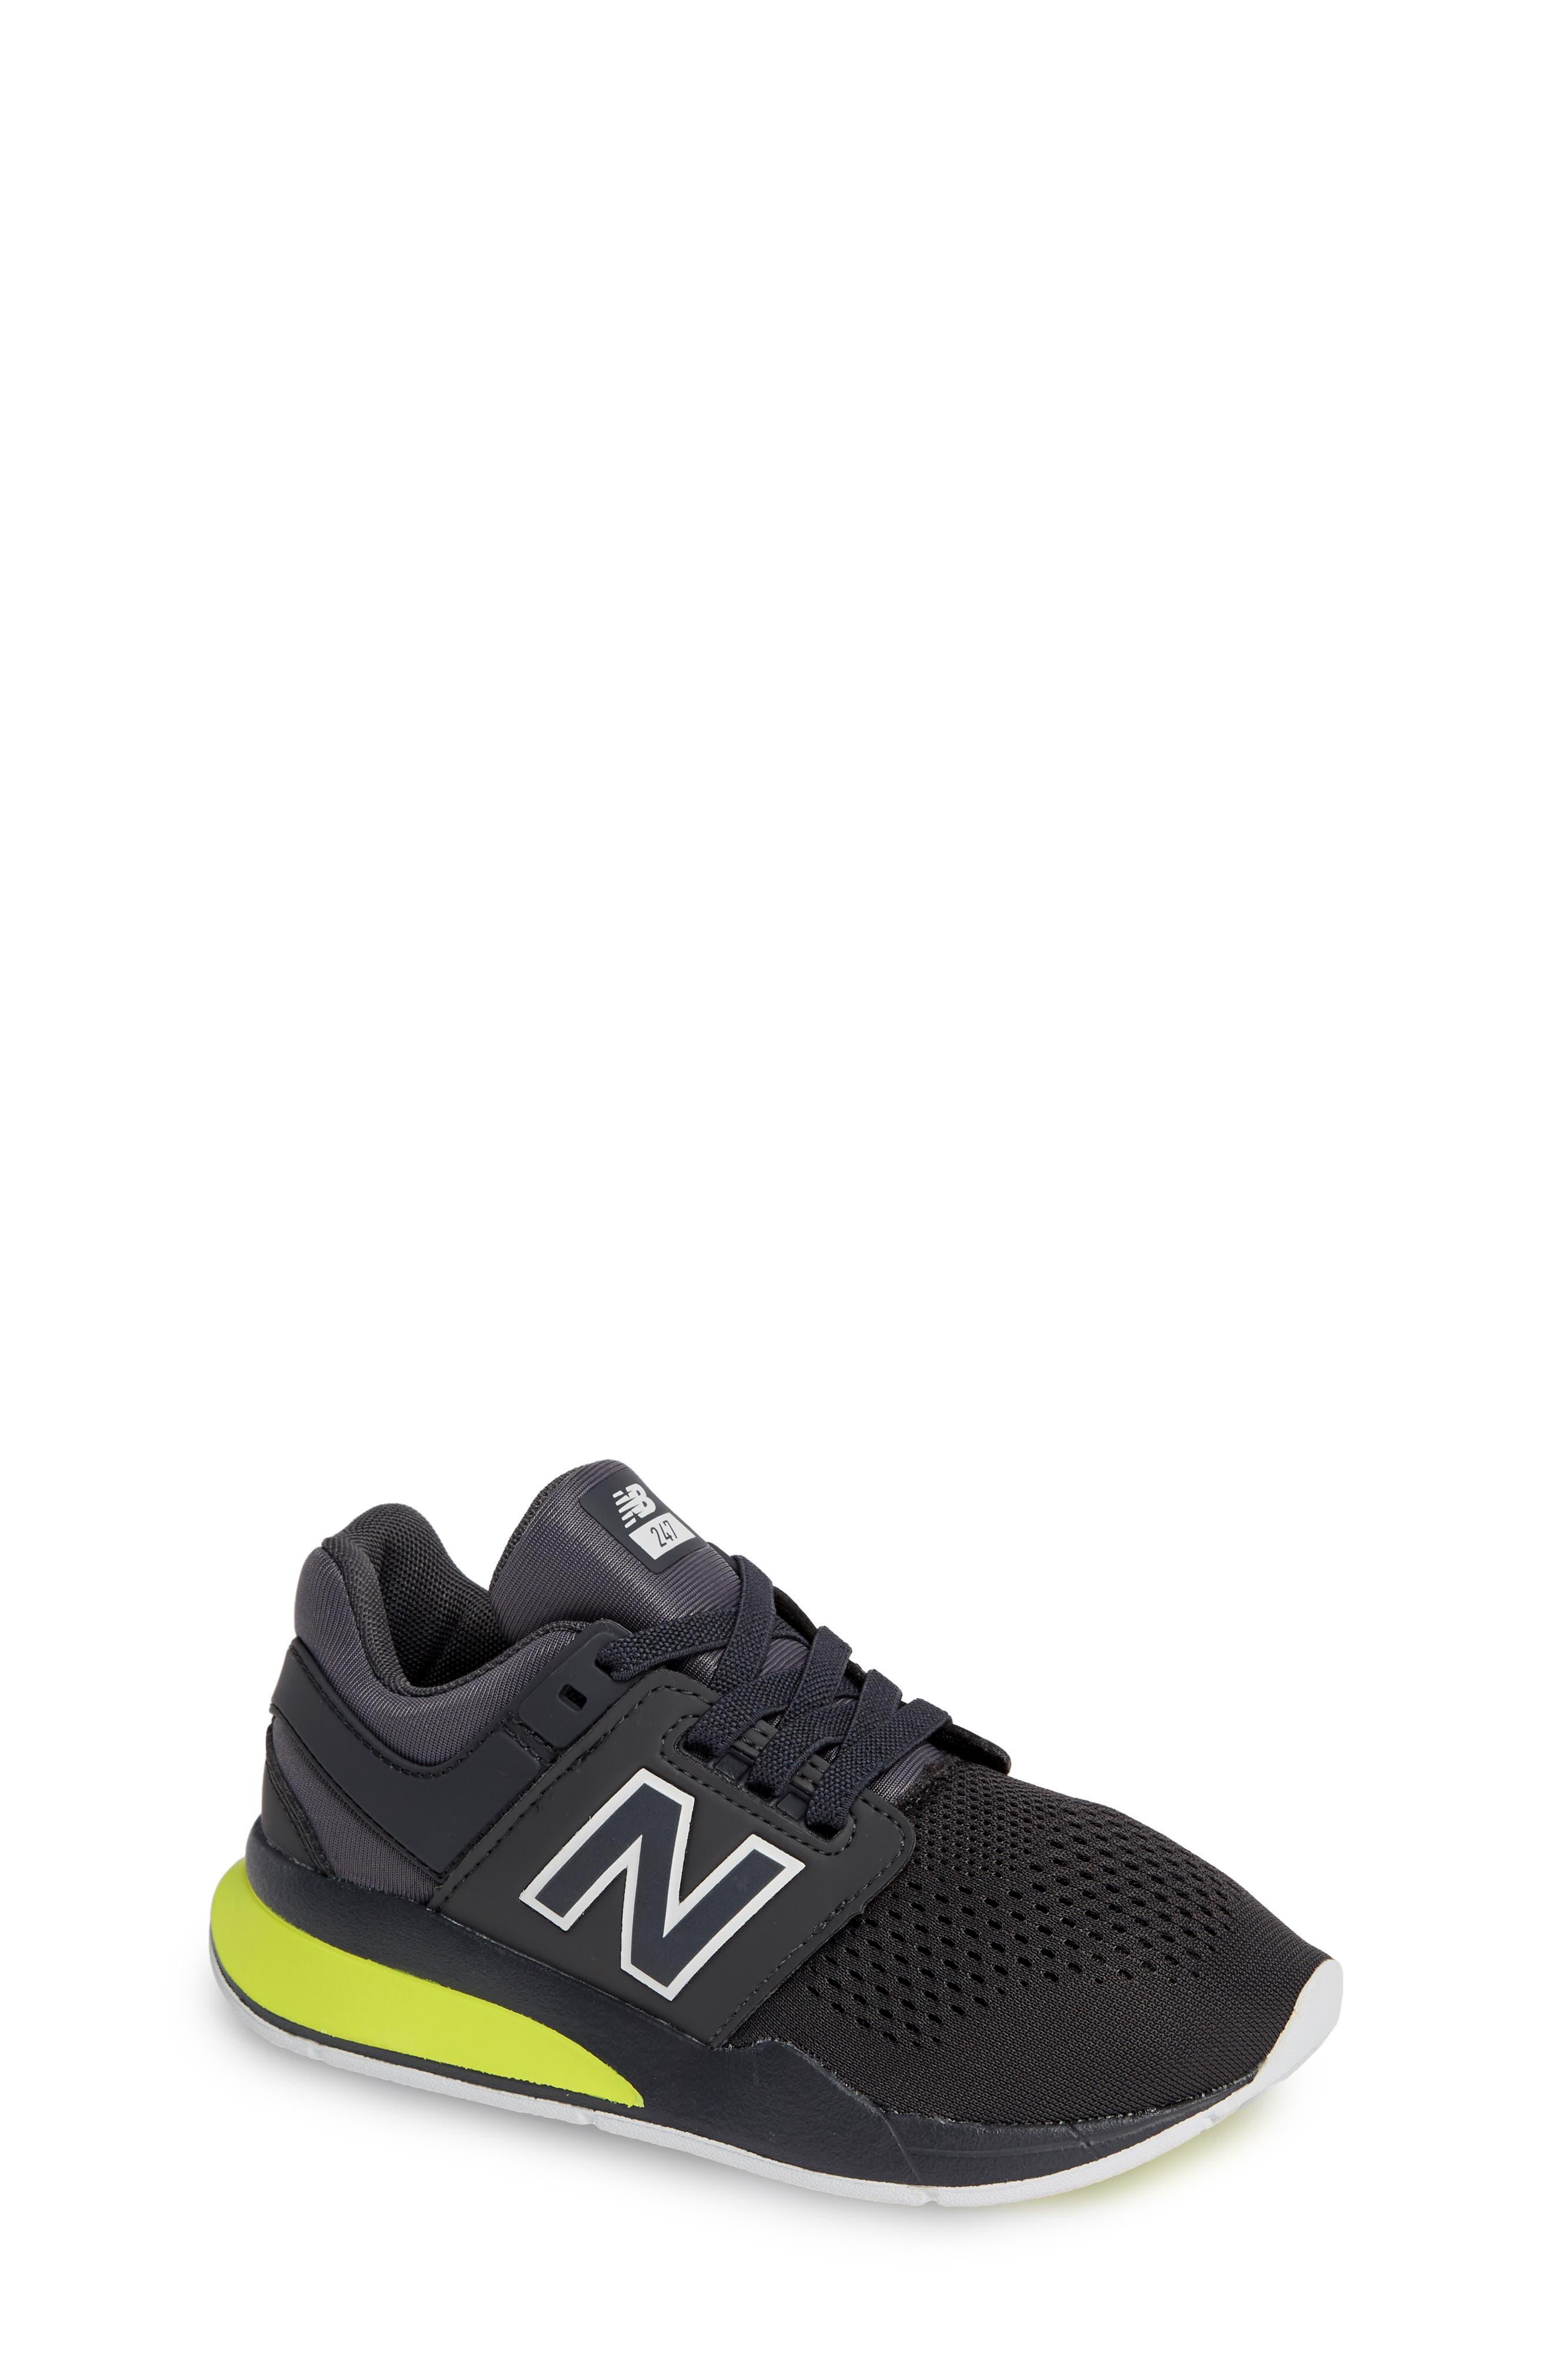 247 Sport Sneaker,                             Main thumbnail 1, color,                             098